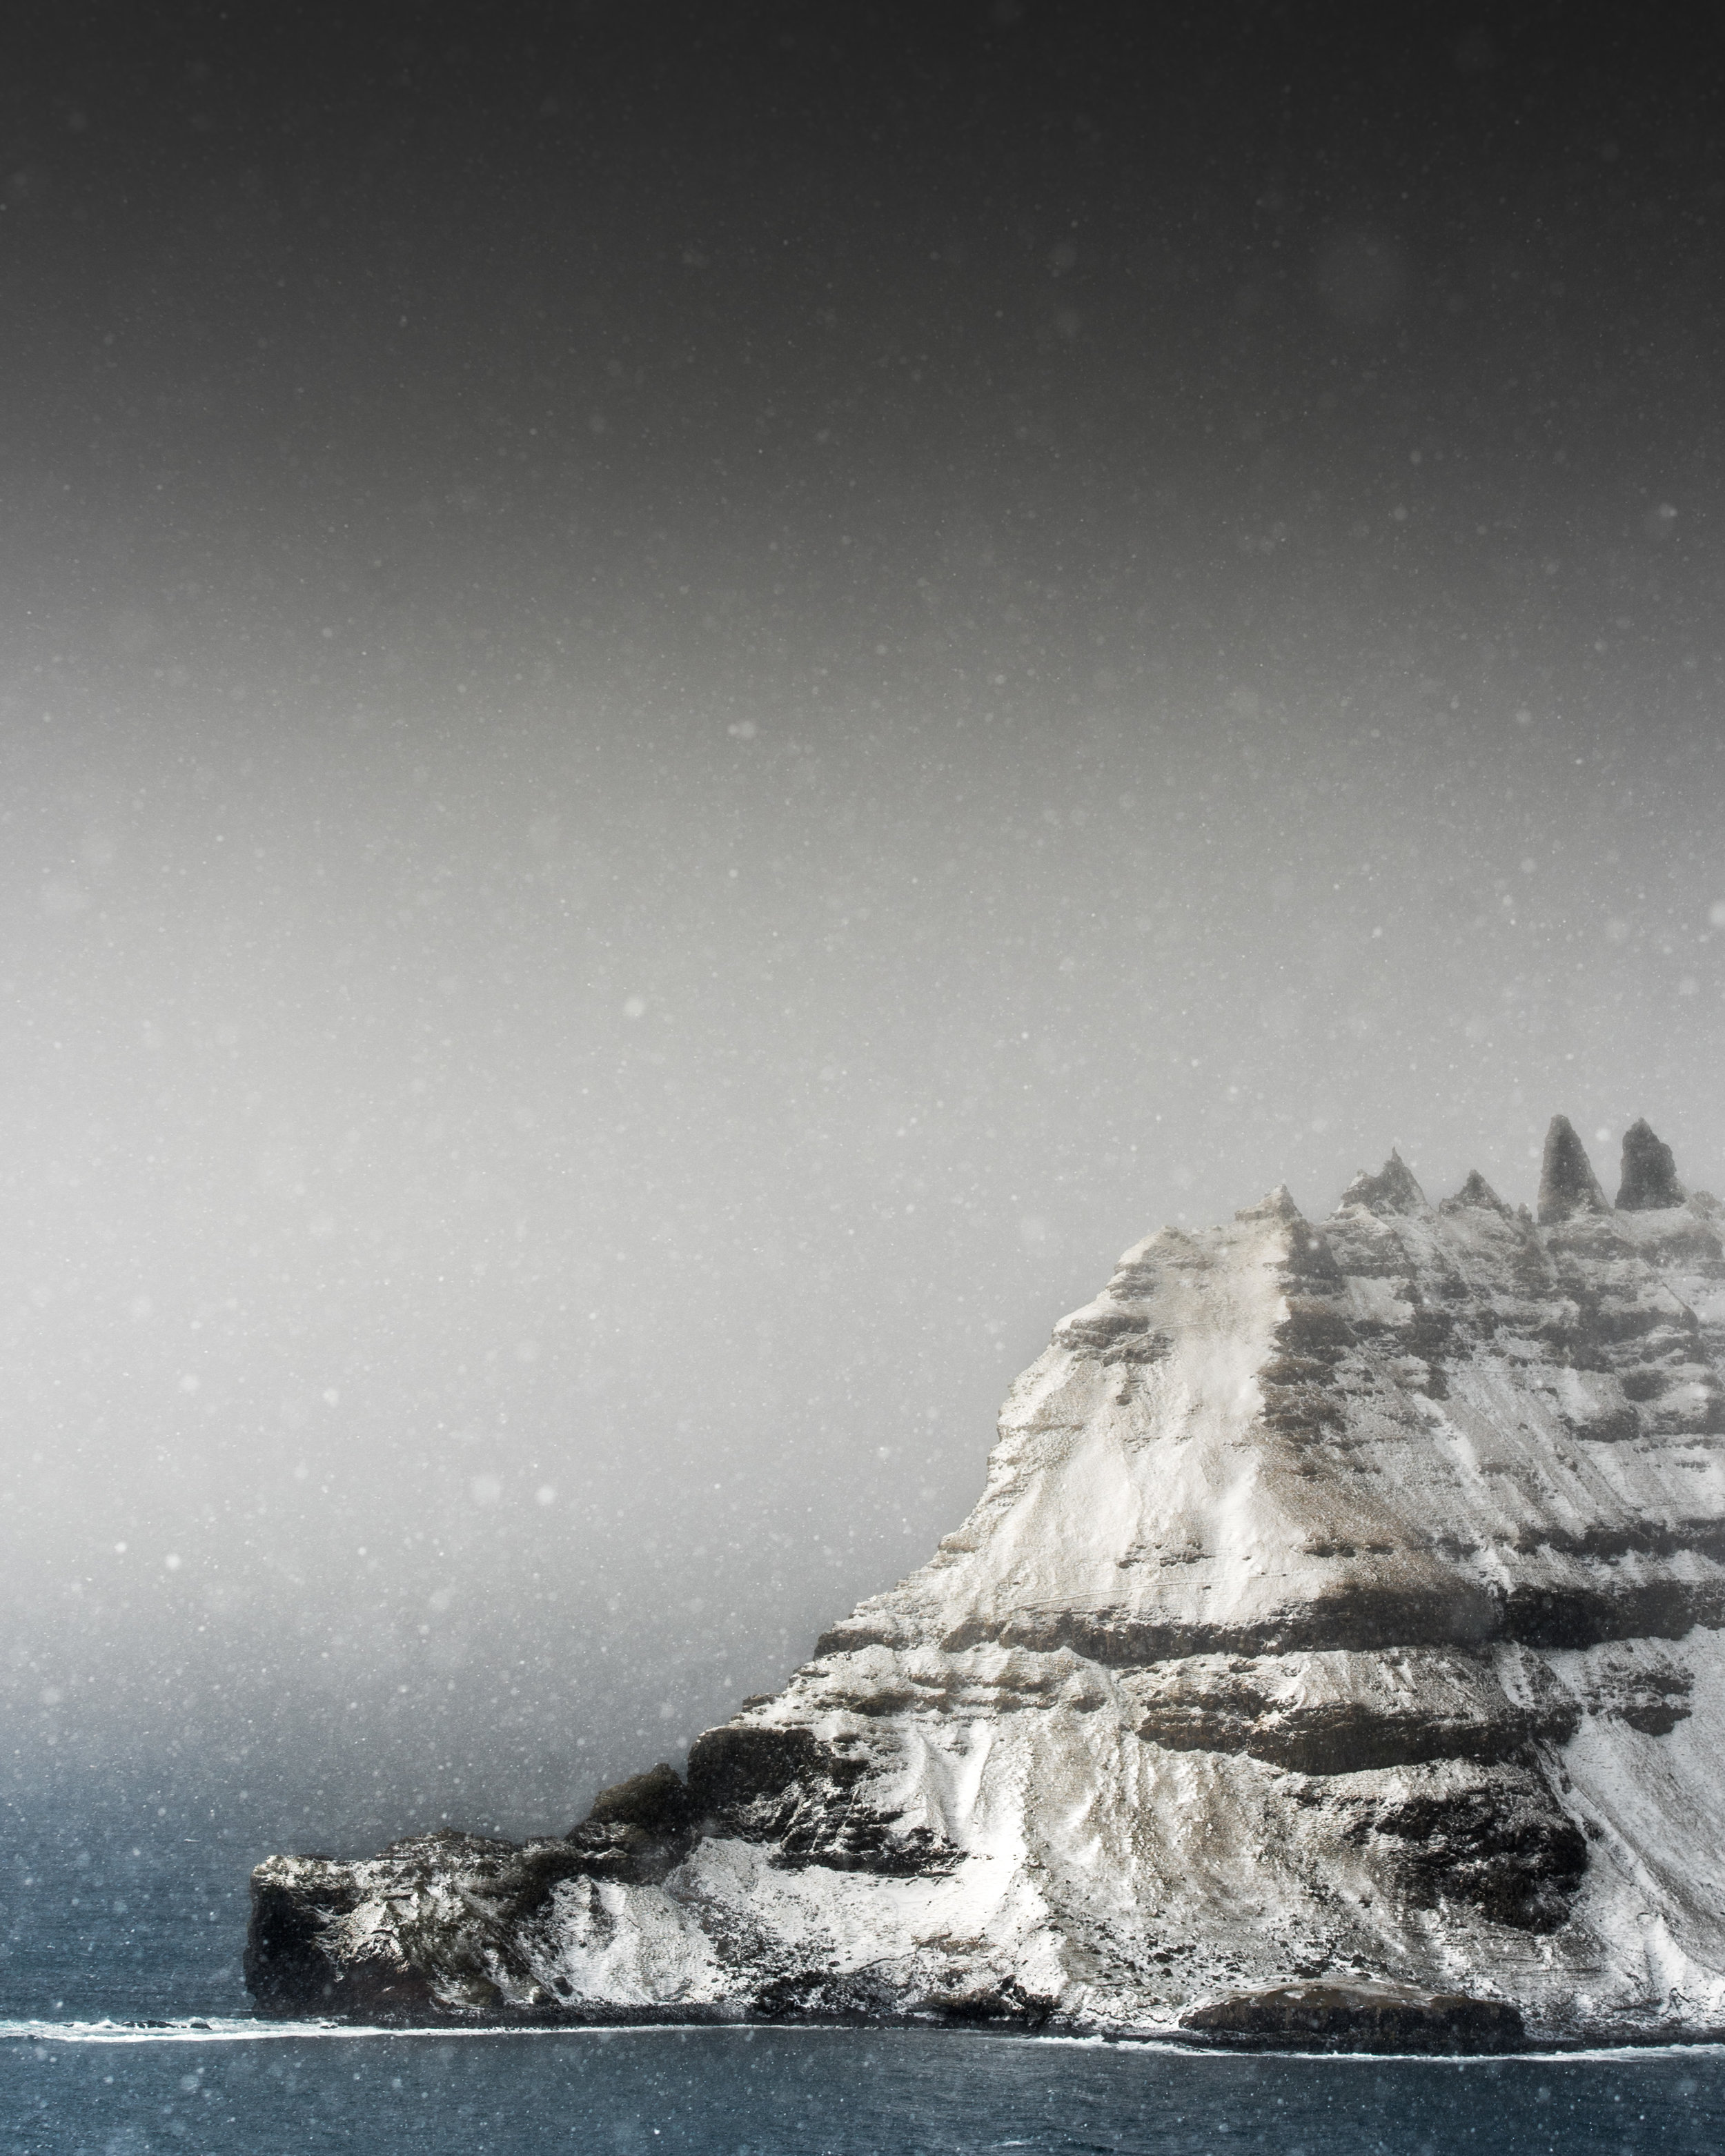 Snowstorm over Tindholmur, Faroe islands